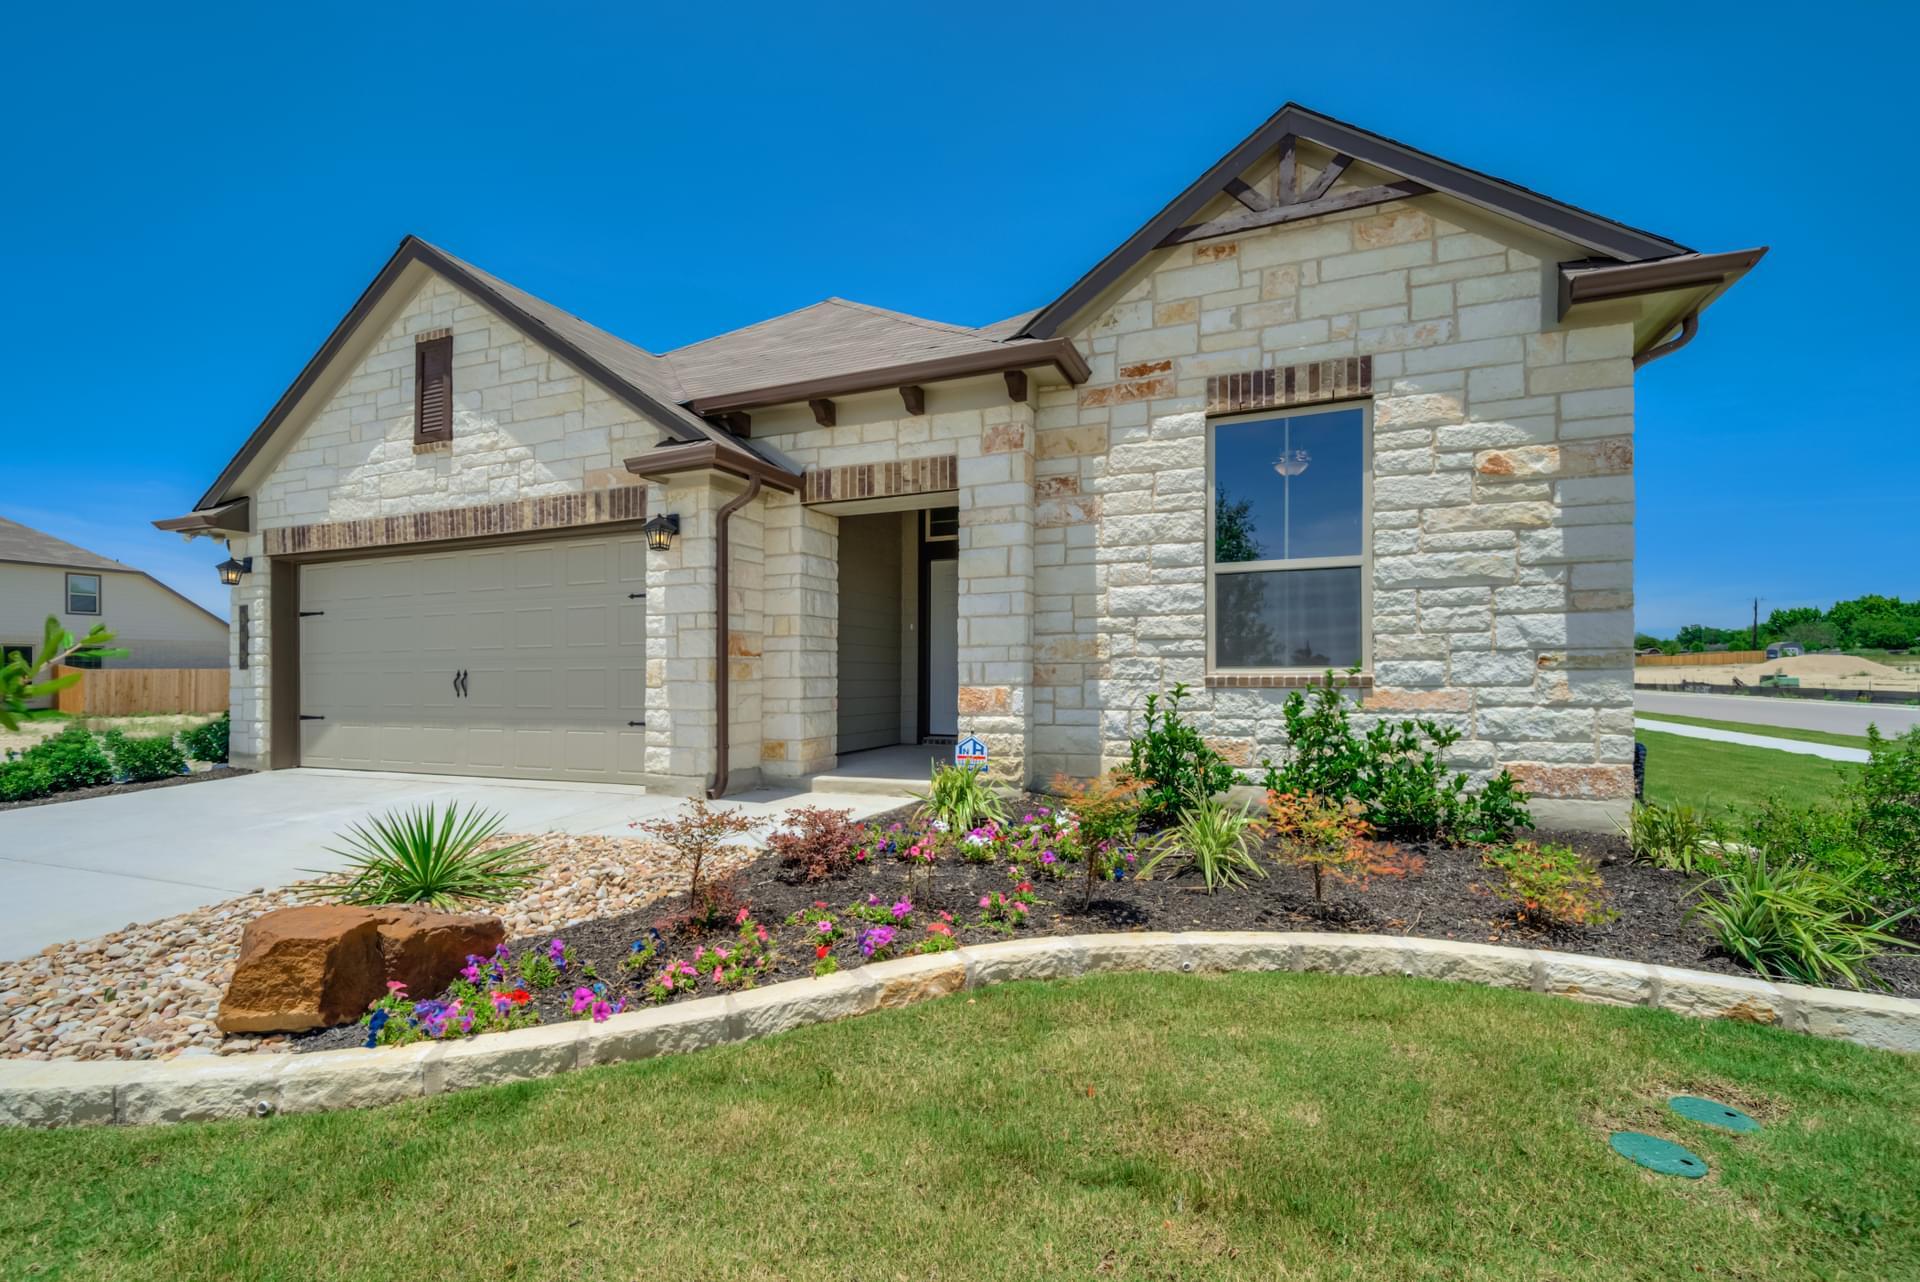 Settlers Pass in Killeen, TX